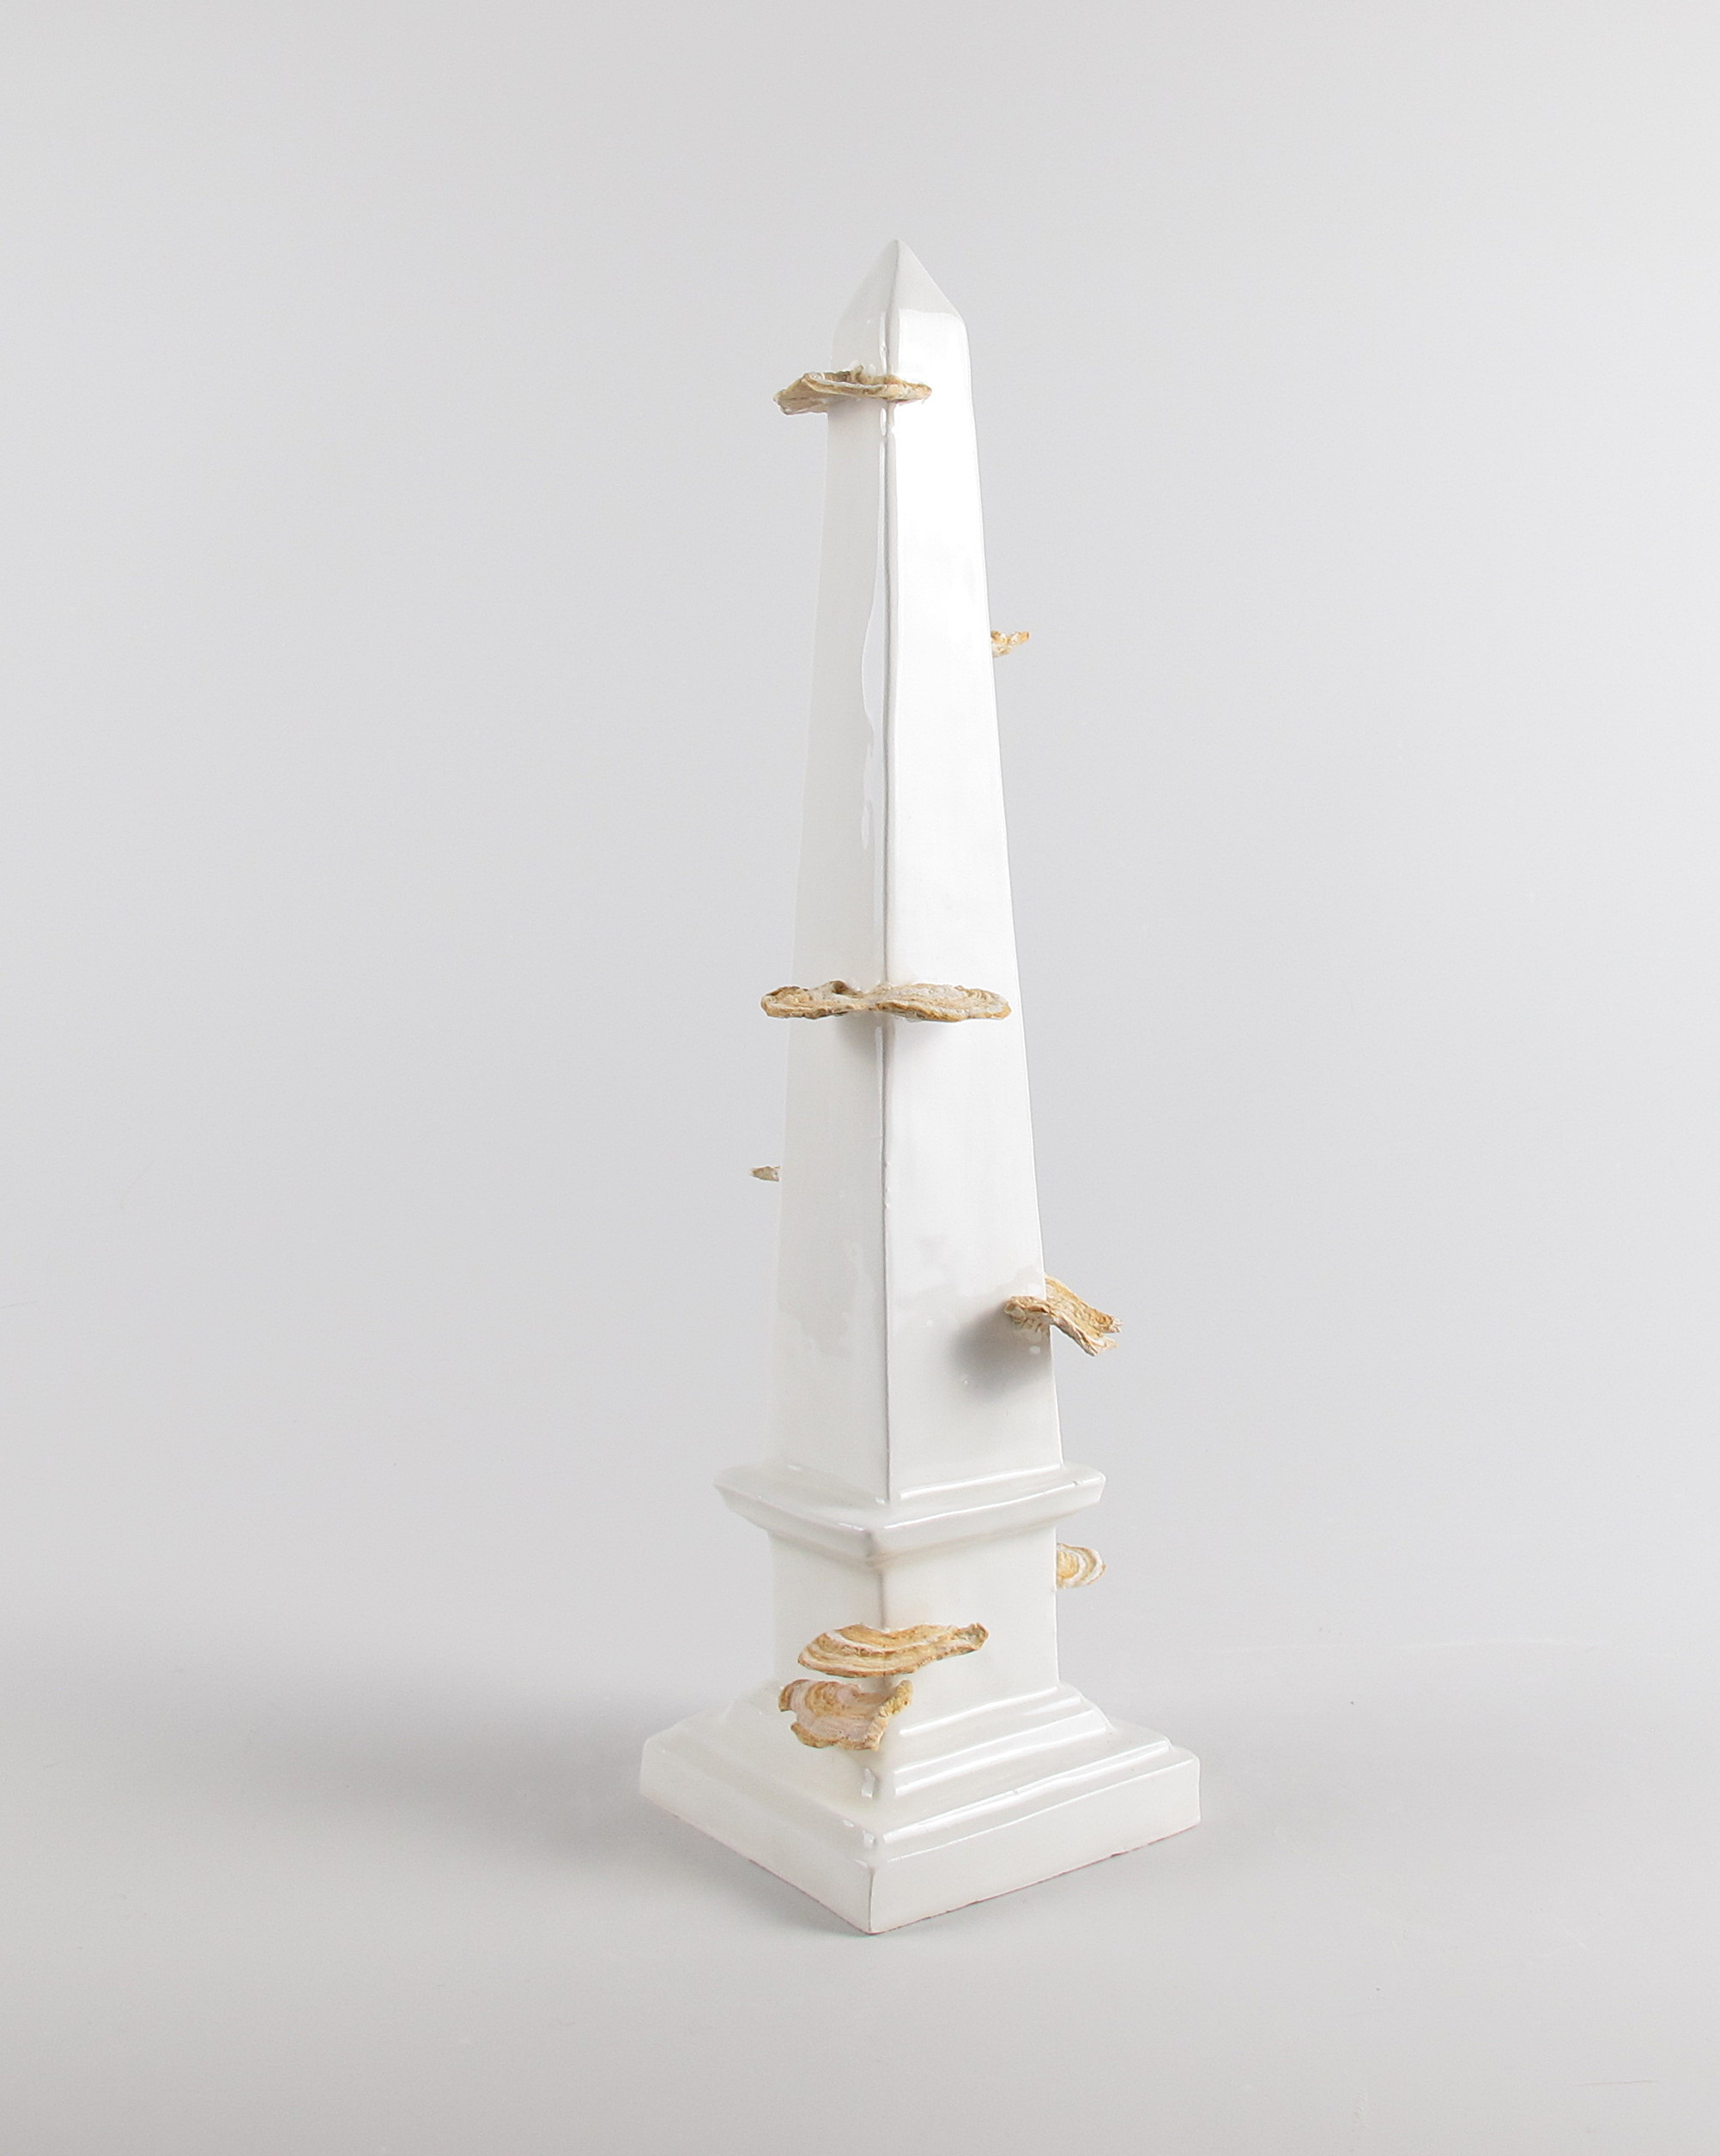 Monumento al tempo, Caterina Sbrana, 2020 contemporary art ceramic